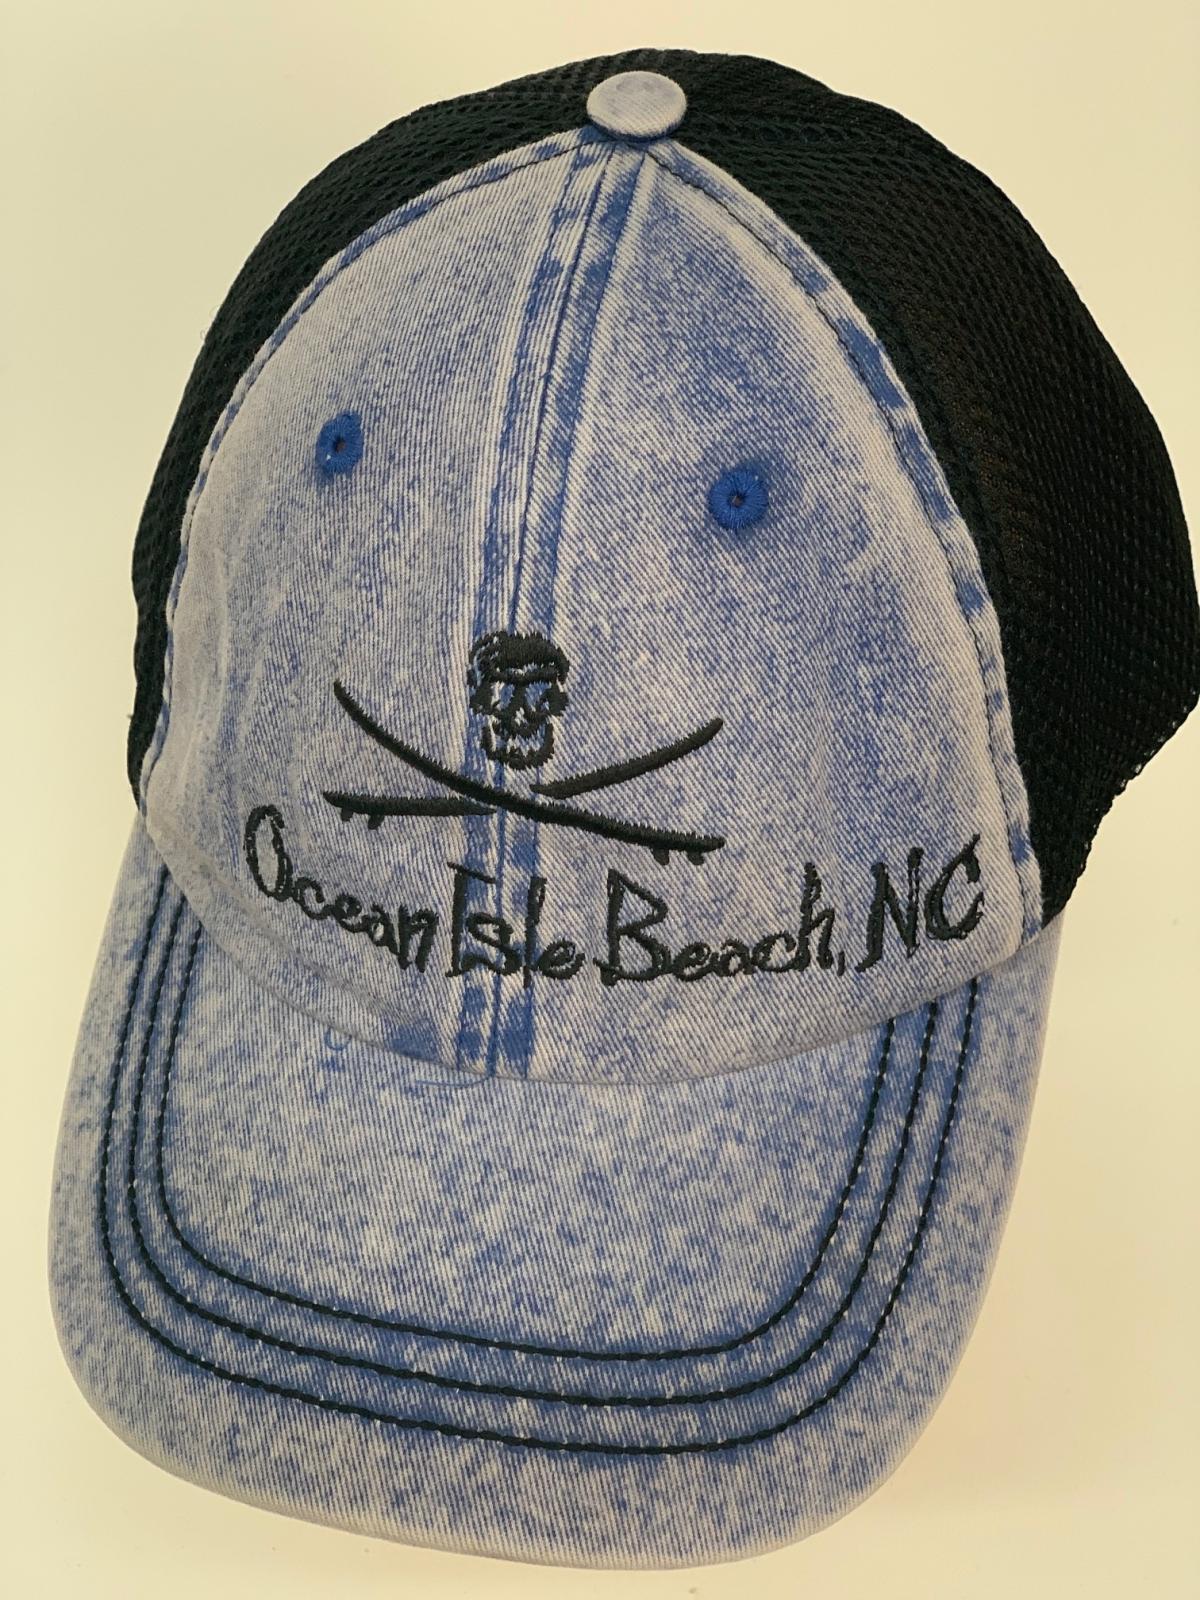 Бейсболка джинс Osean Isle Beach NC с черной сеткой